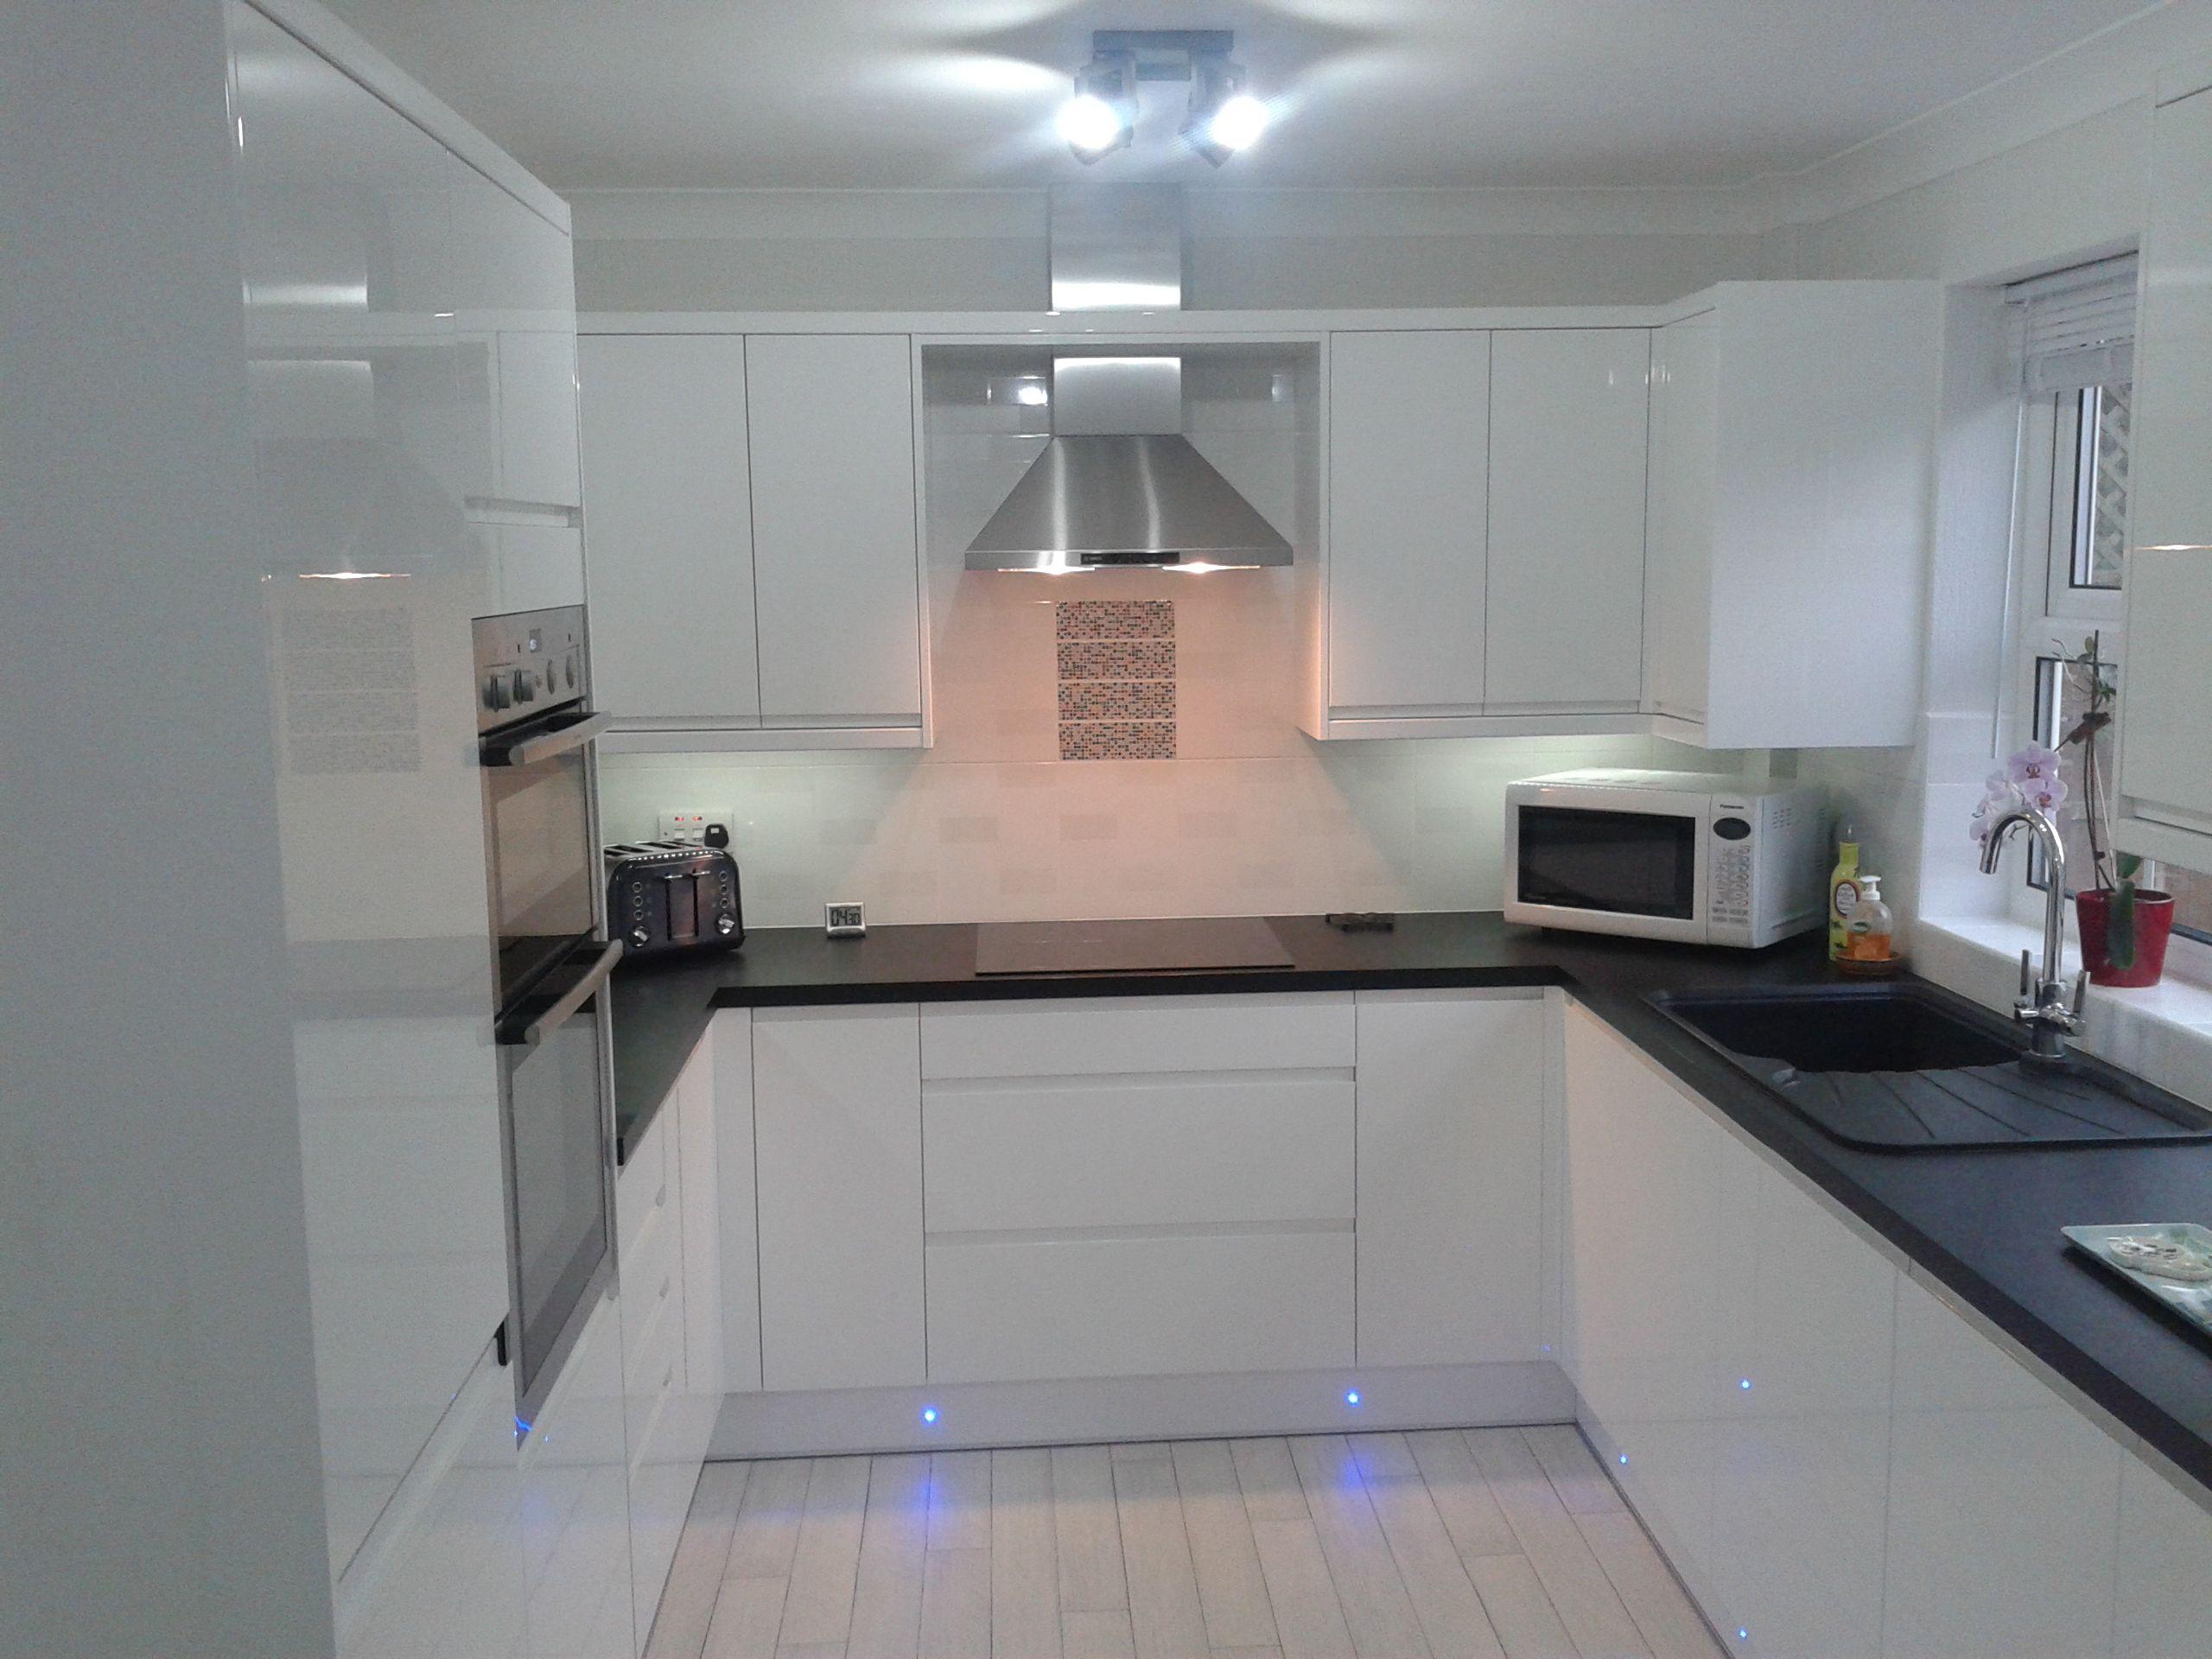 Wren Kitchens Handleless White Gloss what do you think